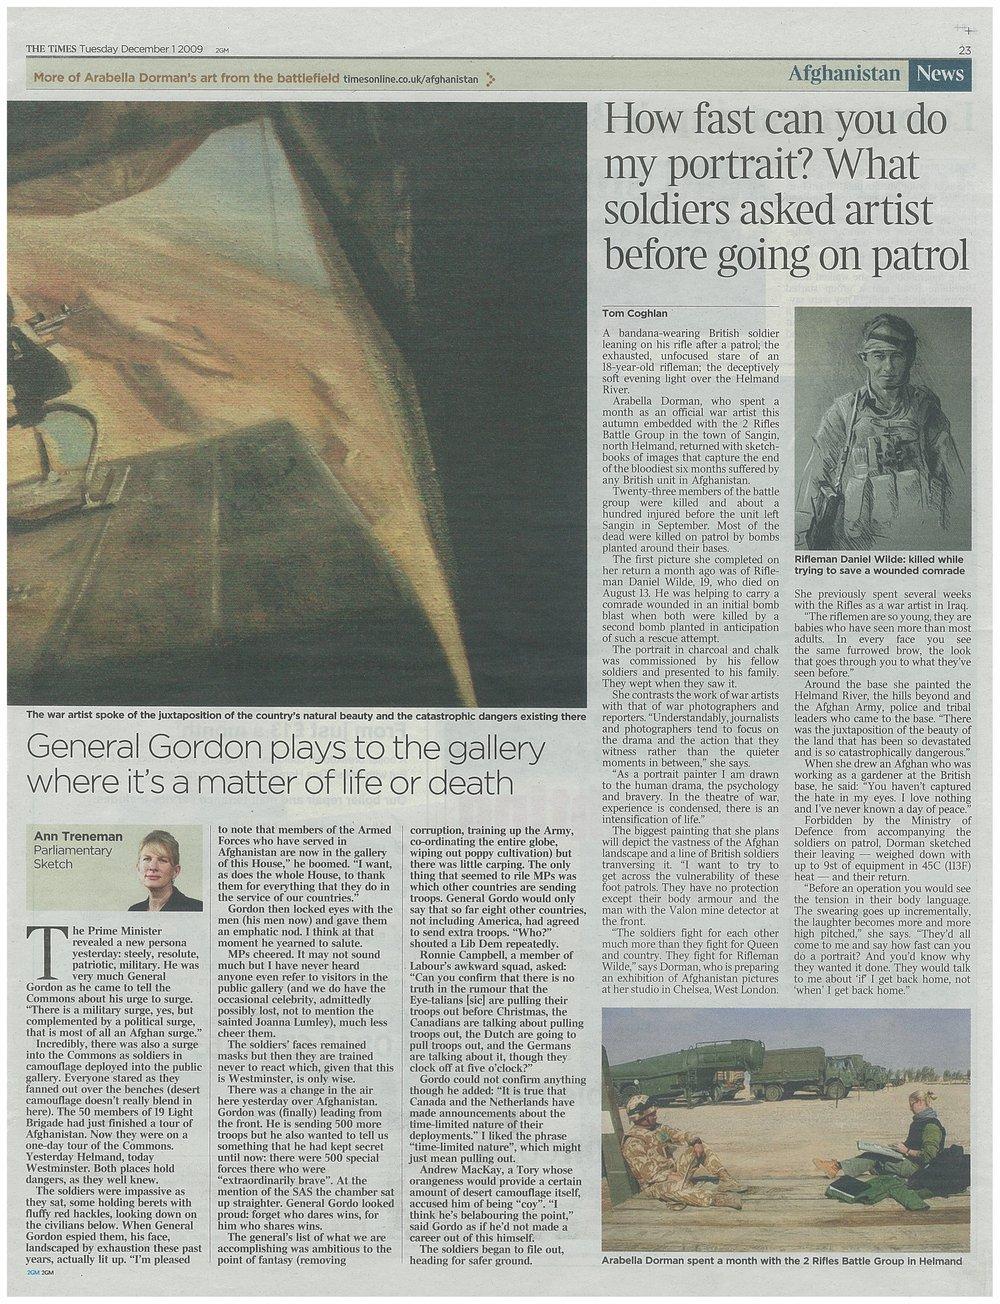 The Times III, December 1 2009.jpg